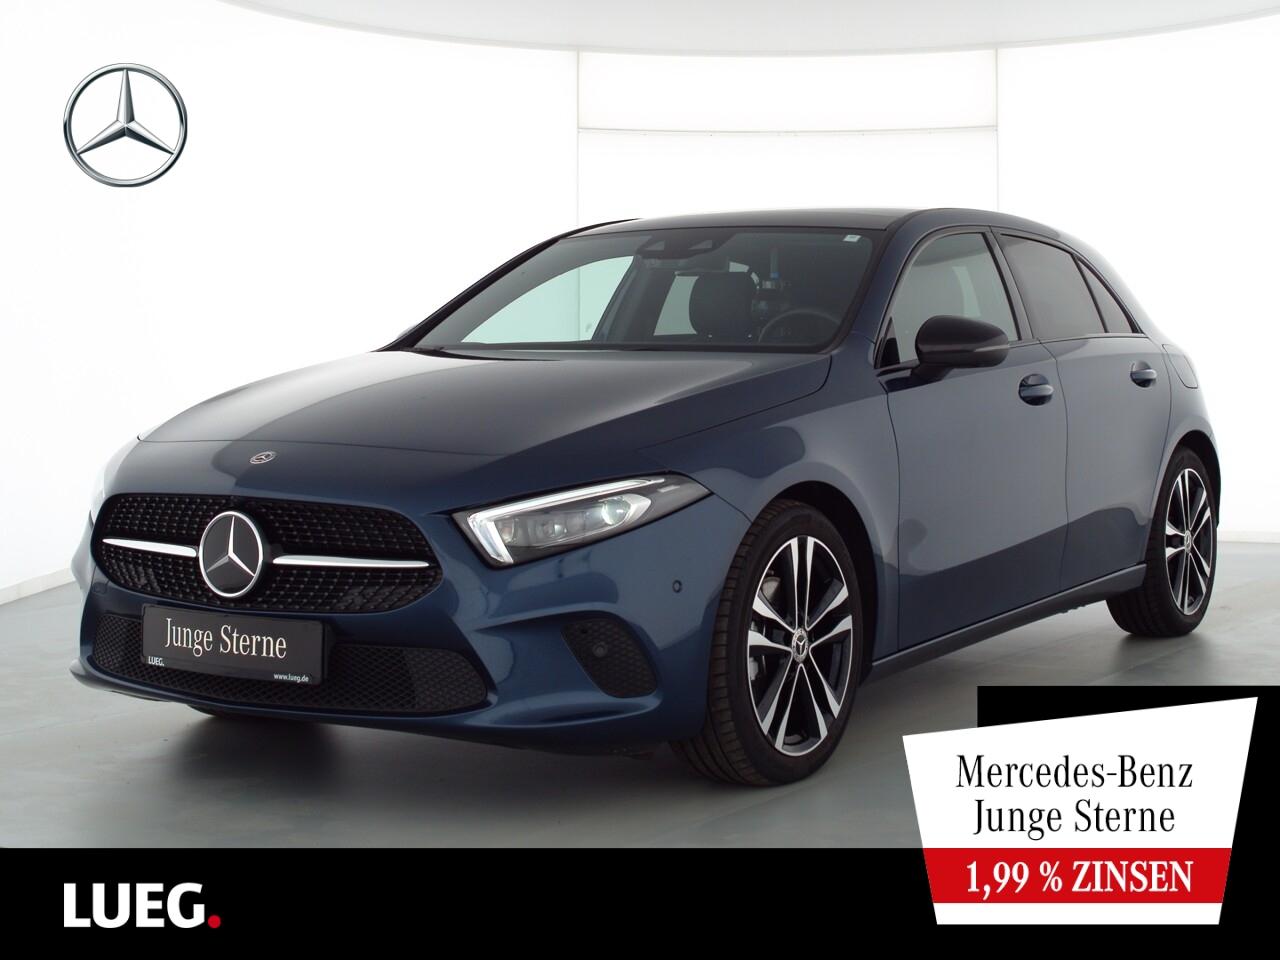 Mercedes-Benz A 200 d Progressive+MBUX+NavP+Pano+Mbeam+AHK+360, Jahr 2019, Diesel